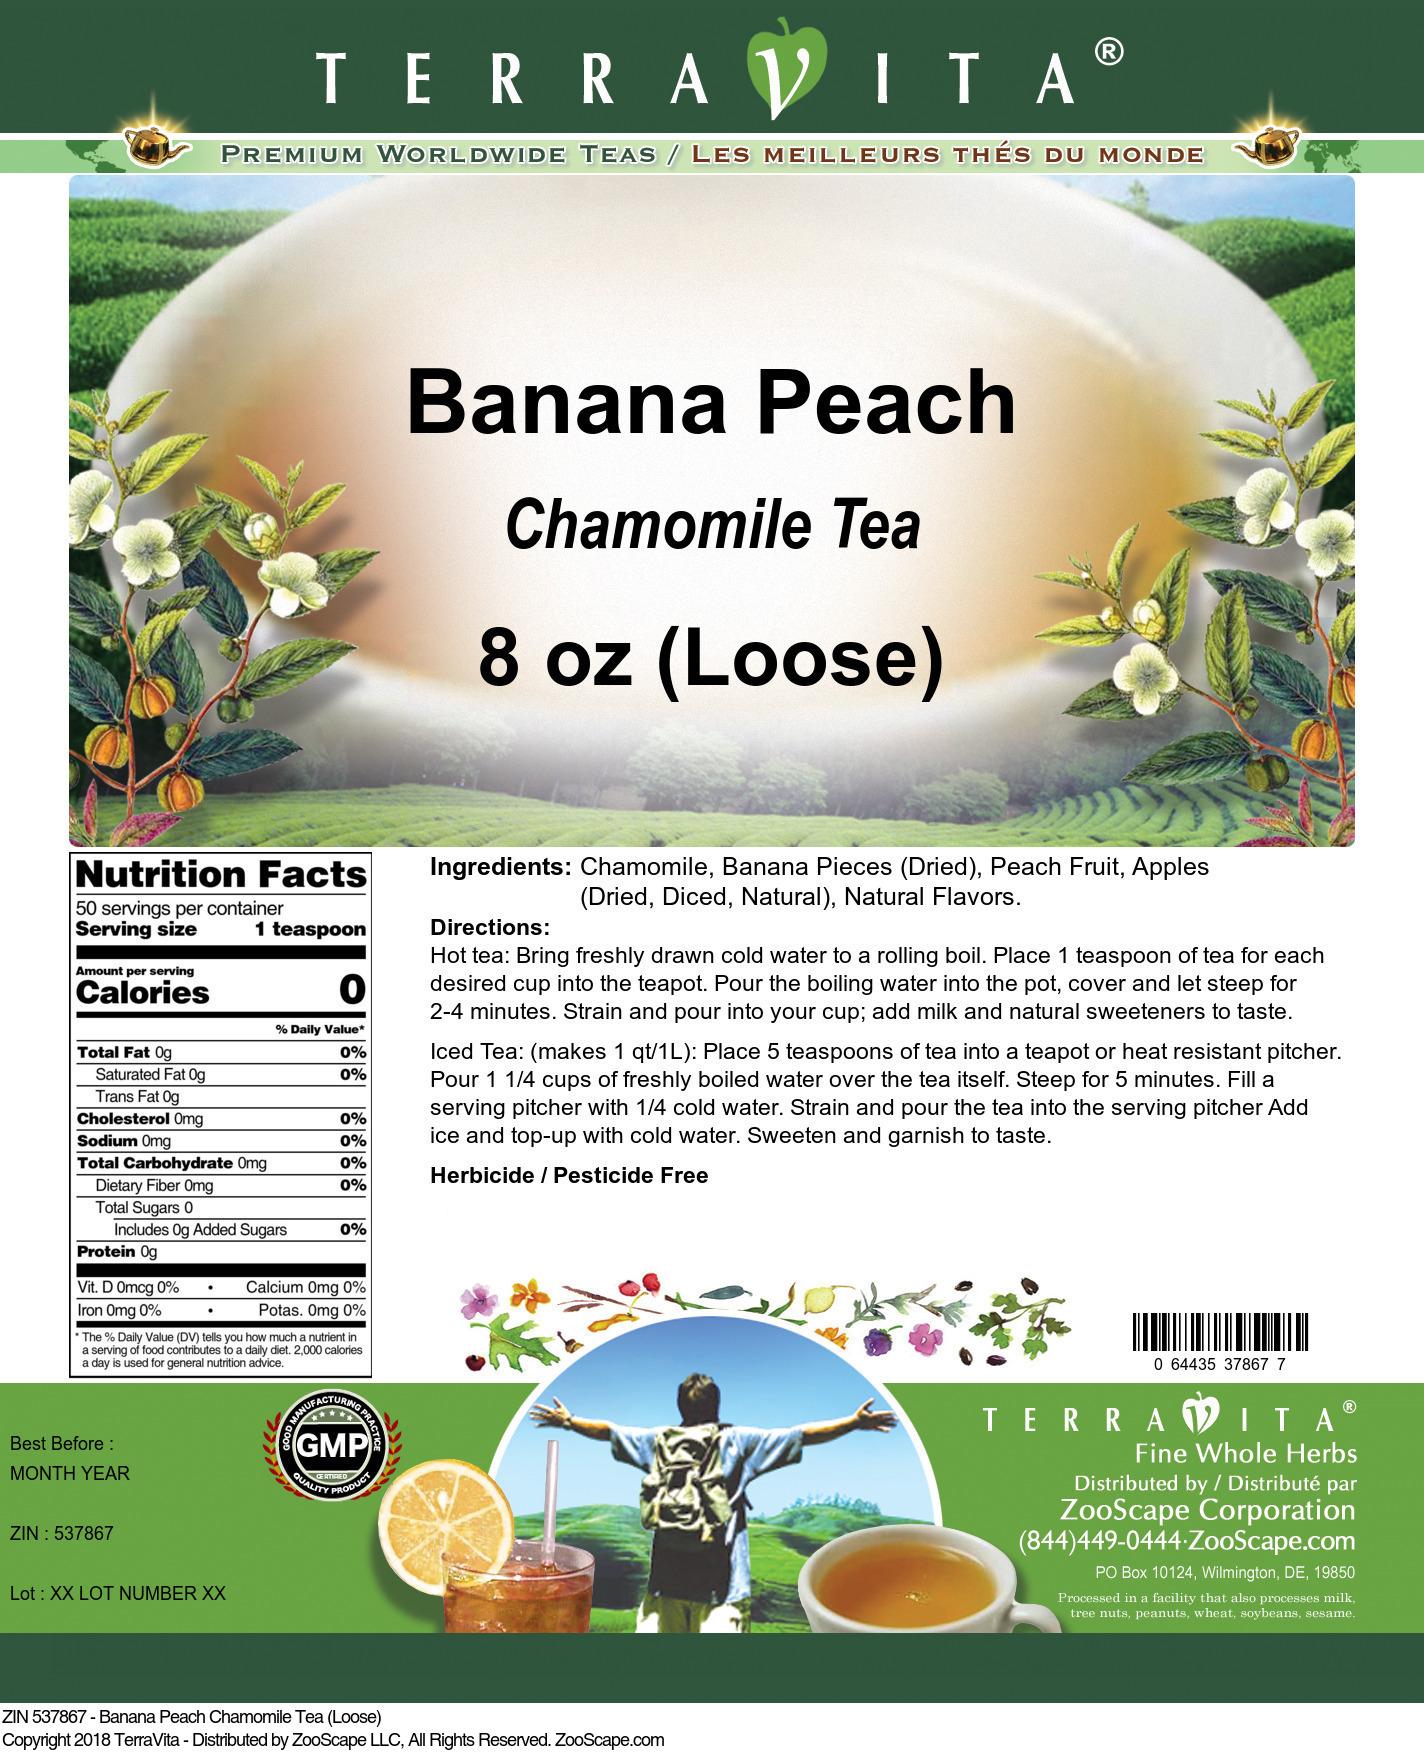 Banana Peach Chamomile Tea (Loose)